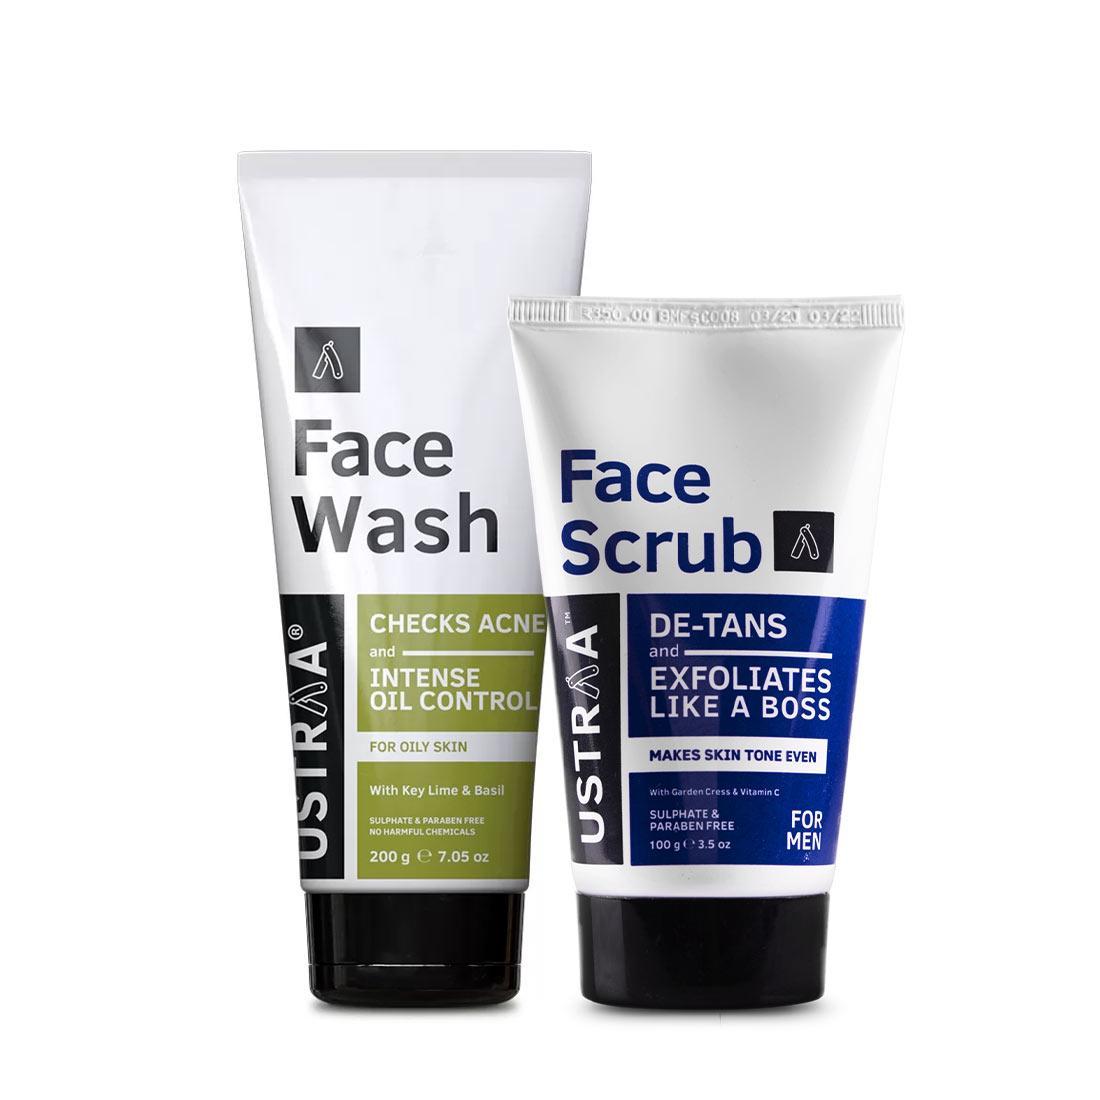 face scrub, facescrubs, facewash, facewashes, Ustraa Face Wash and Face Scrub Combo for Men: Get Deep Cleansing, De-Tanning and Exfoliation